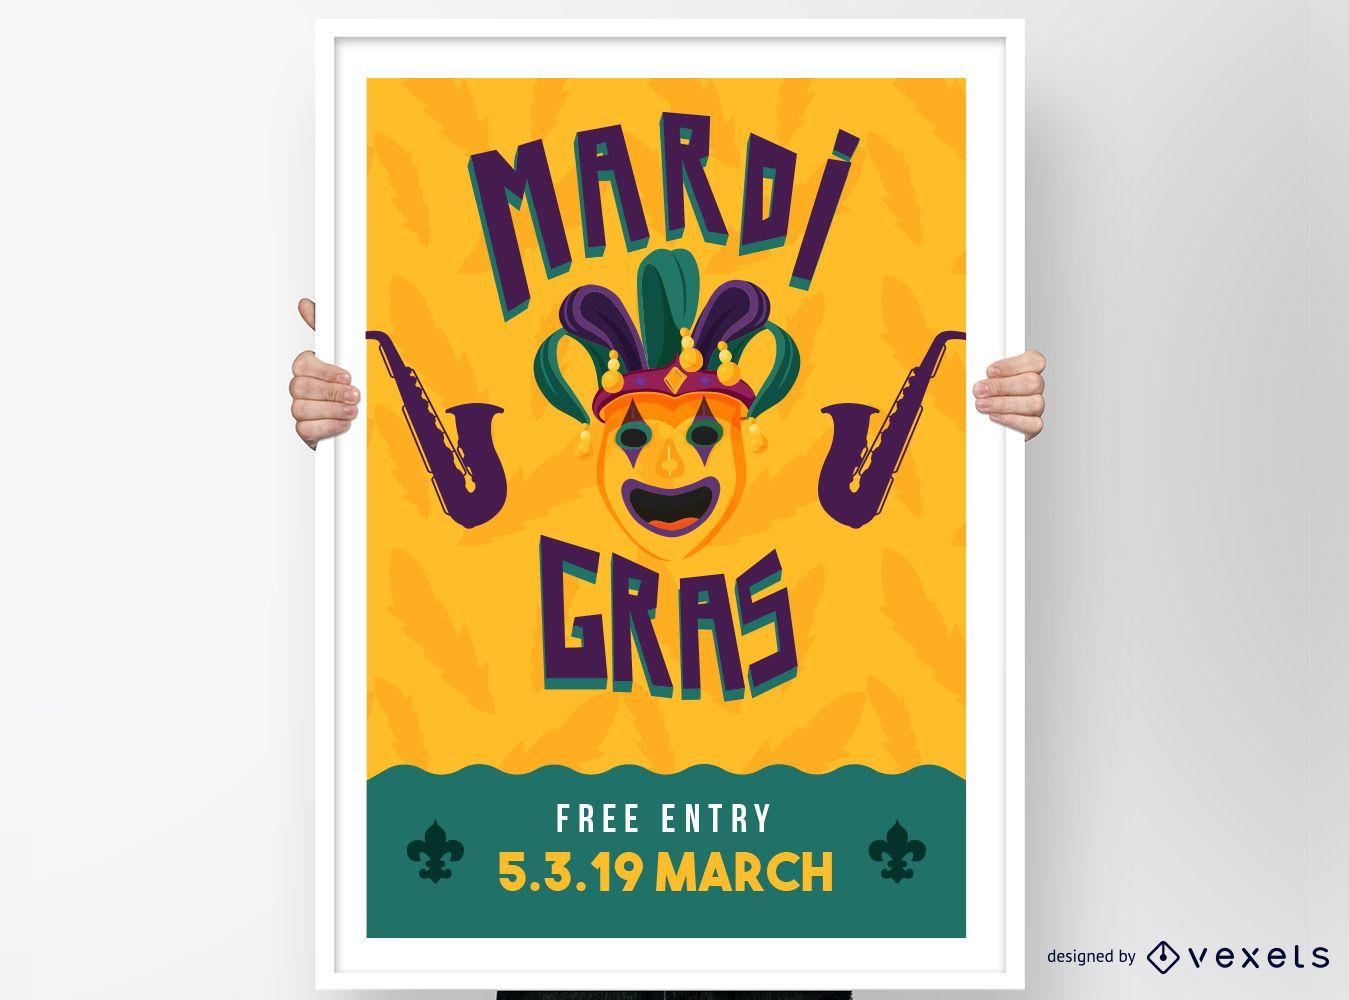 Mardi Gras Clown Poster Design